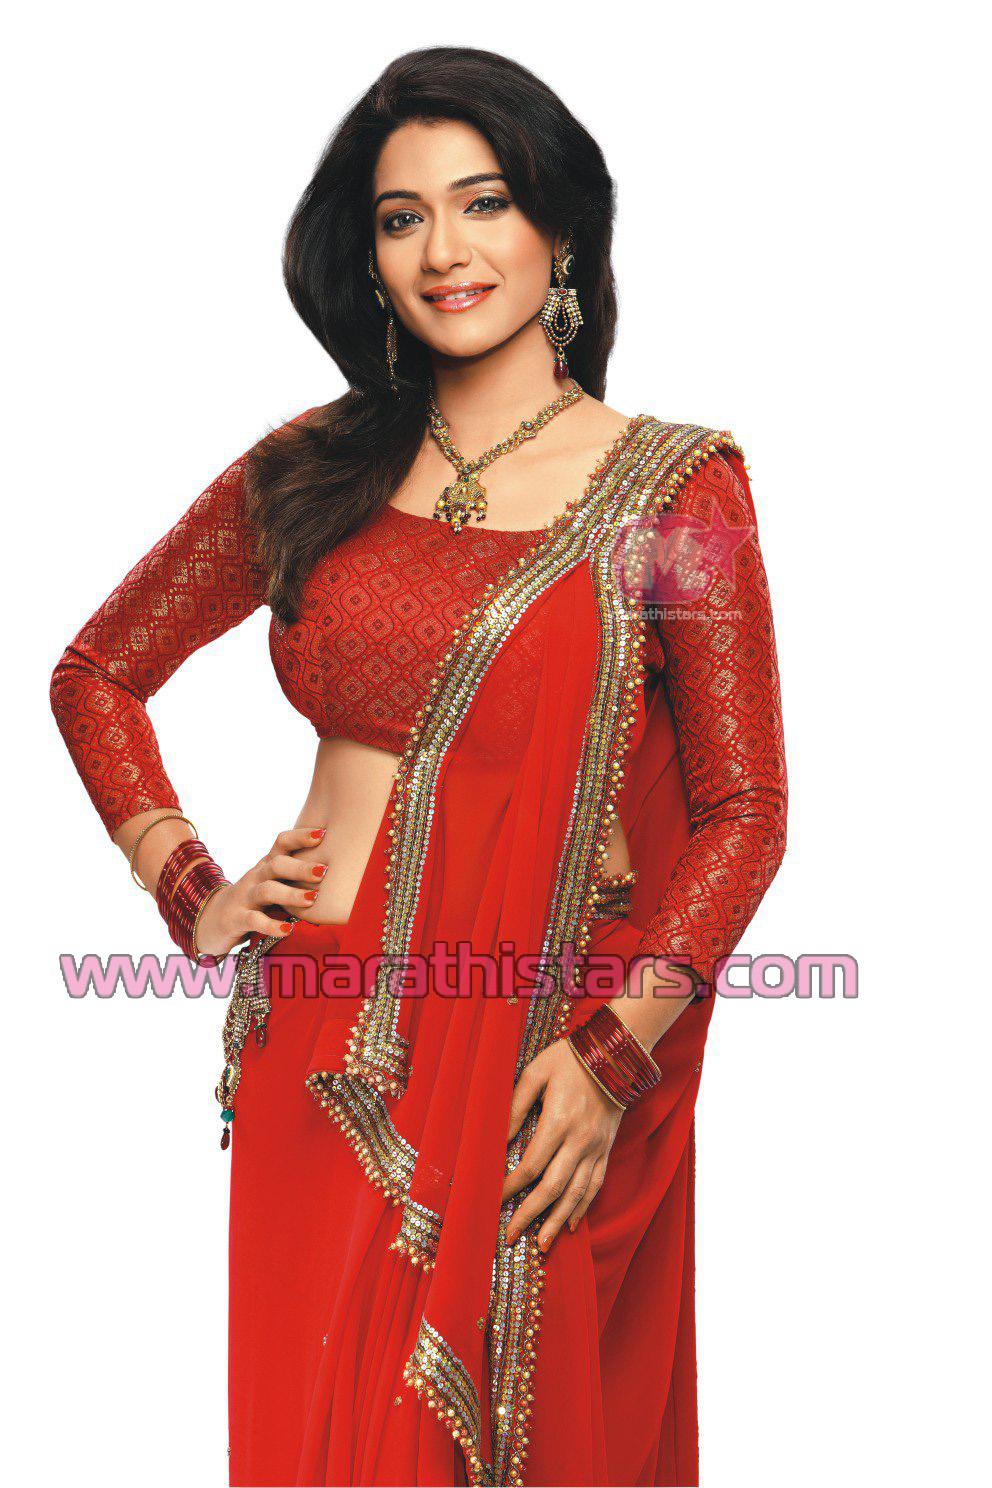 Urmila Kanitkar-Kothare Marathi Actress Photos,Biography -1004